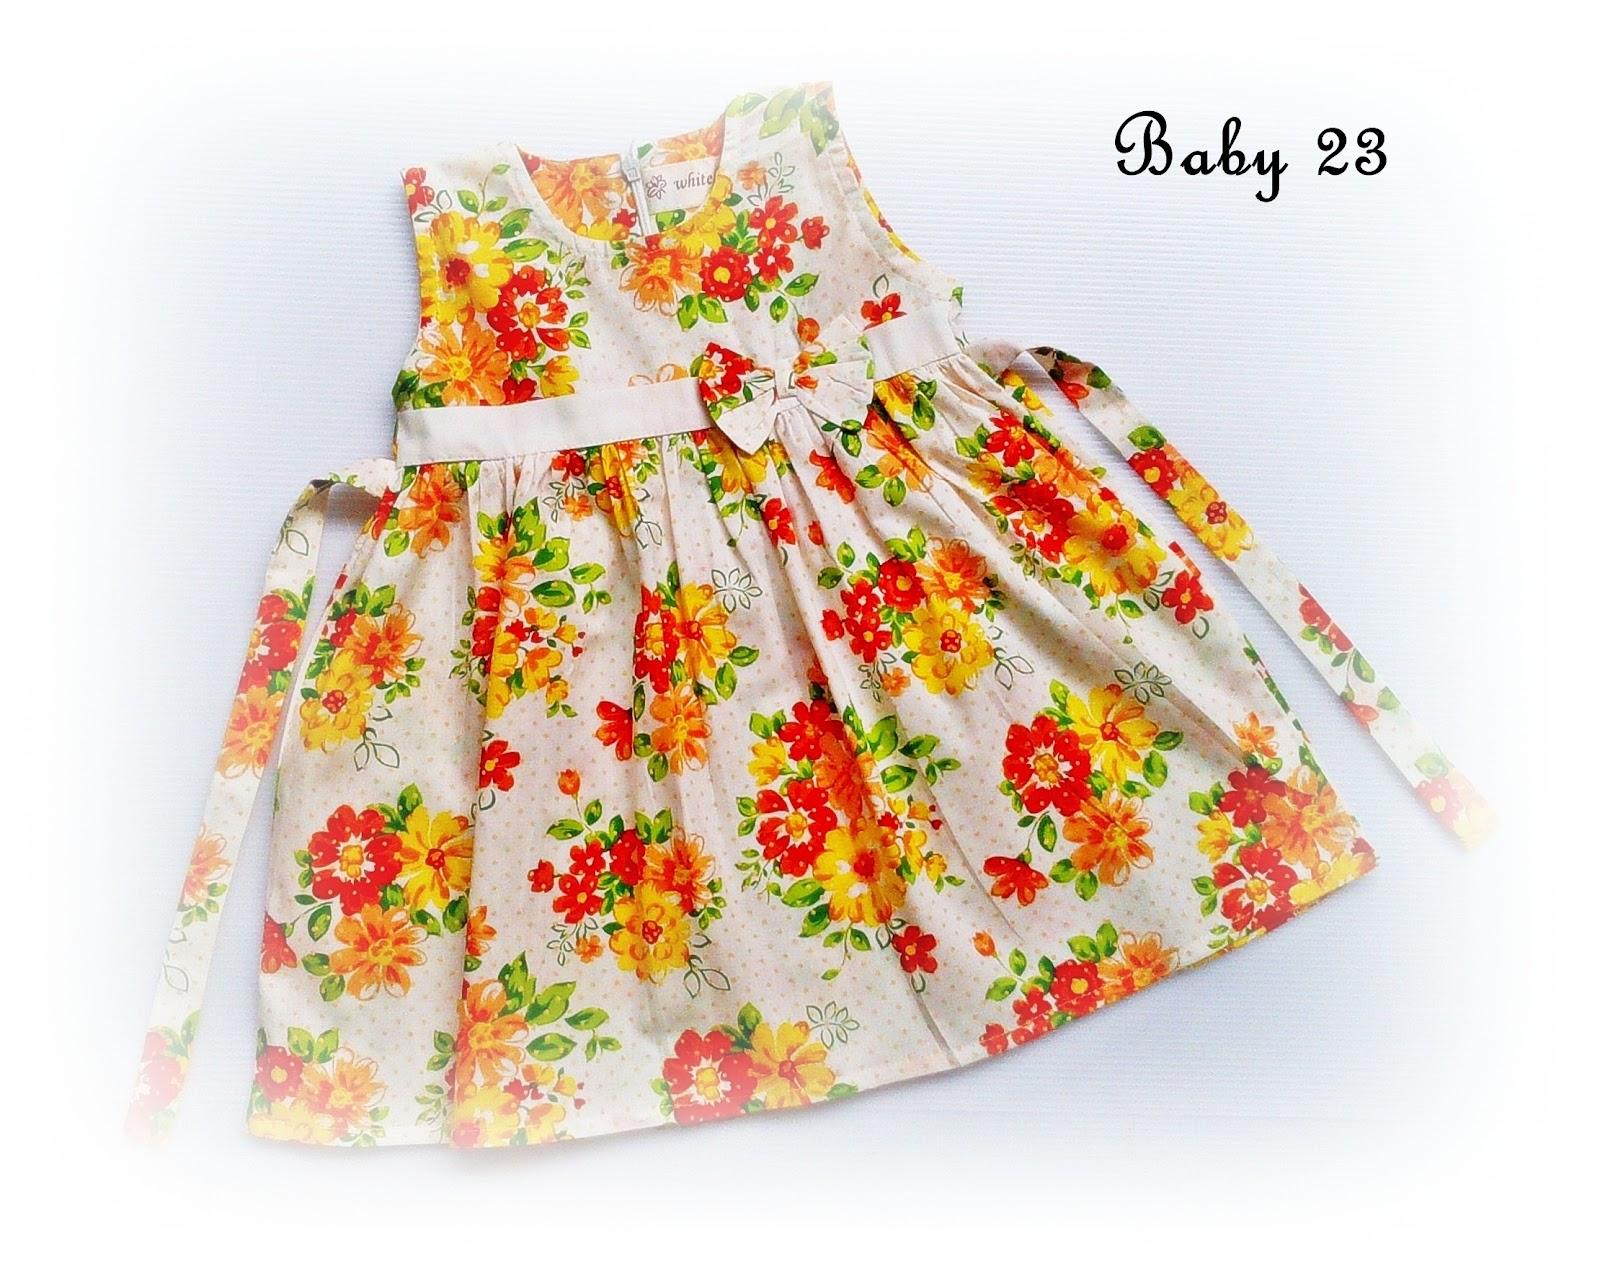 grosir baju bayi merk libby: Jual Jumper Bayi Murah